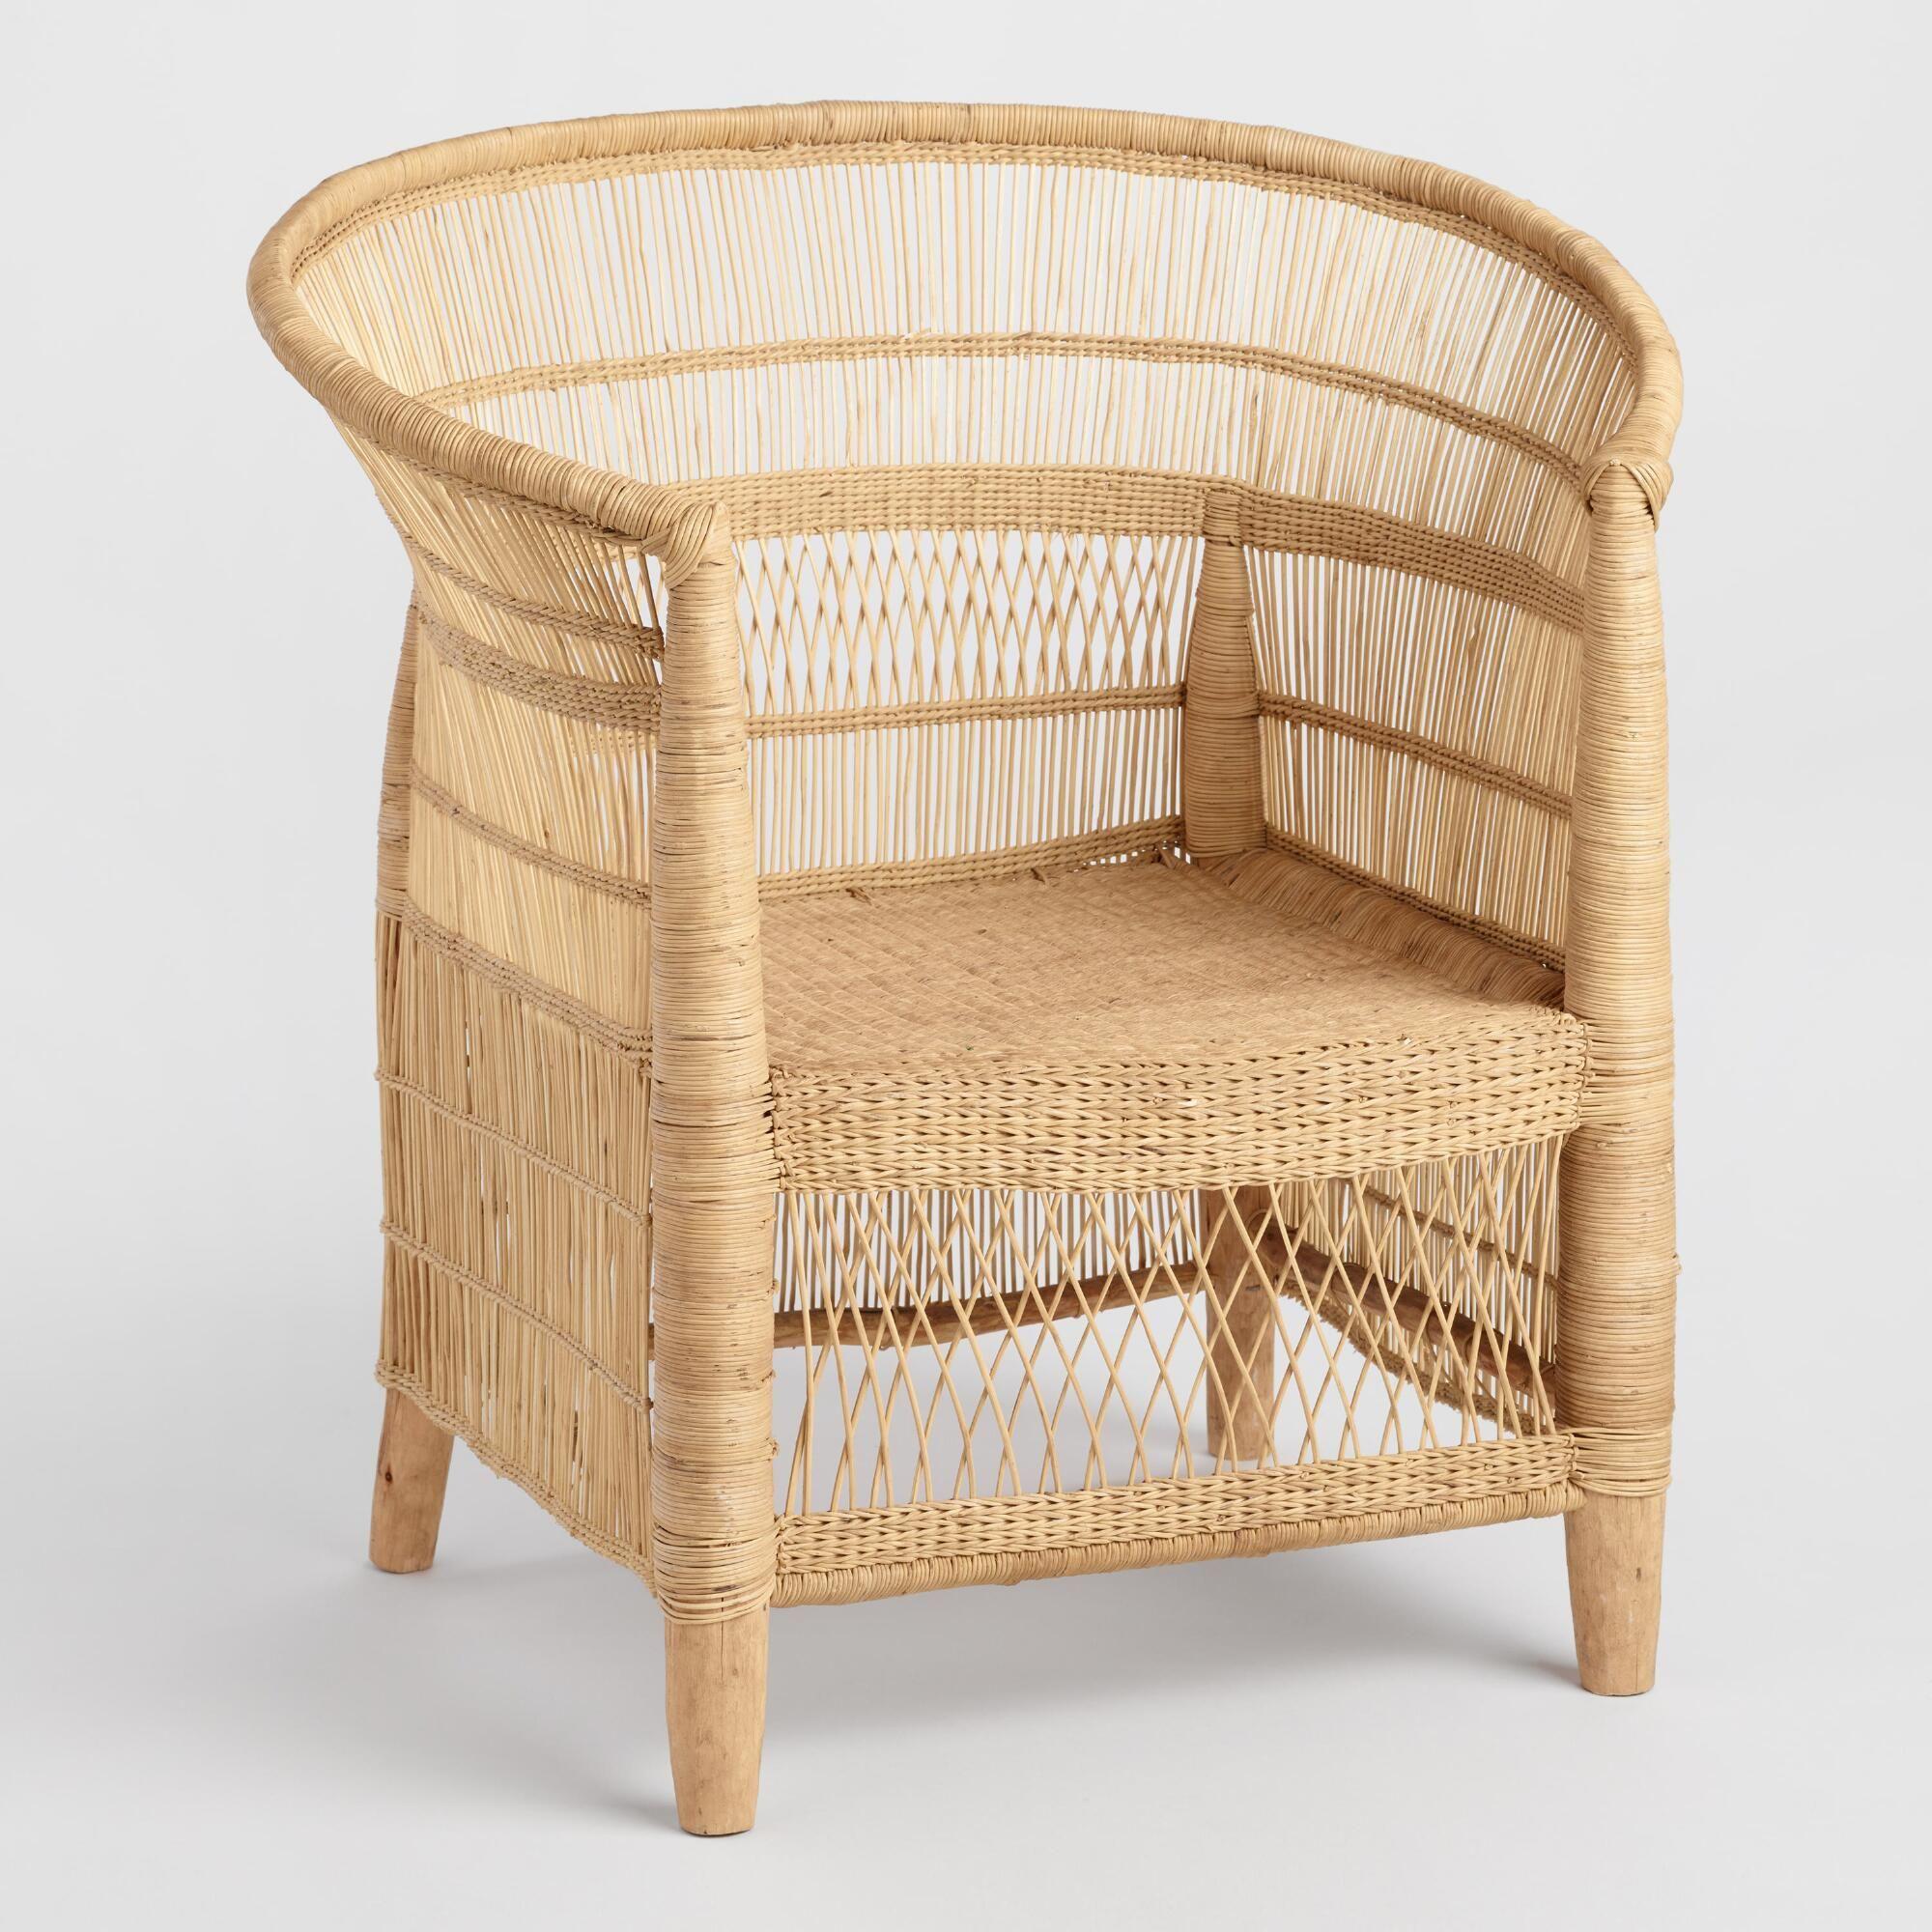 Malawi Wicker Chair by World Market  Summer Garden House